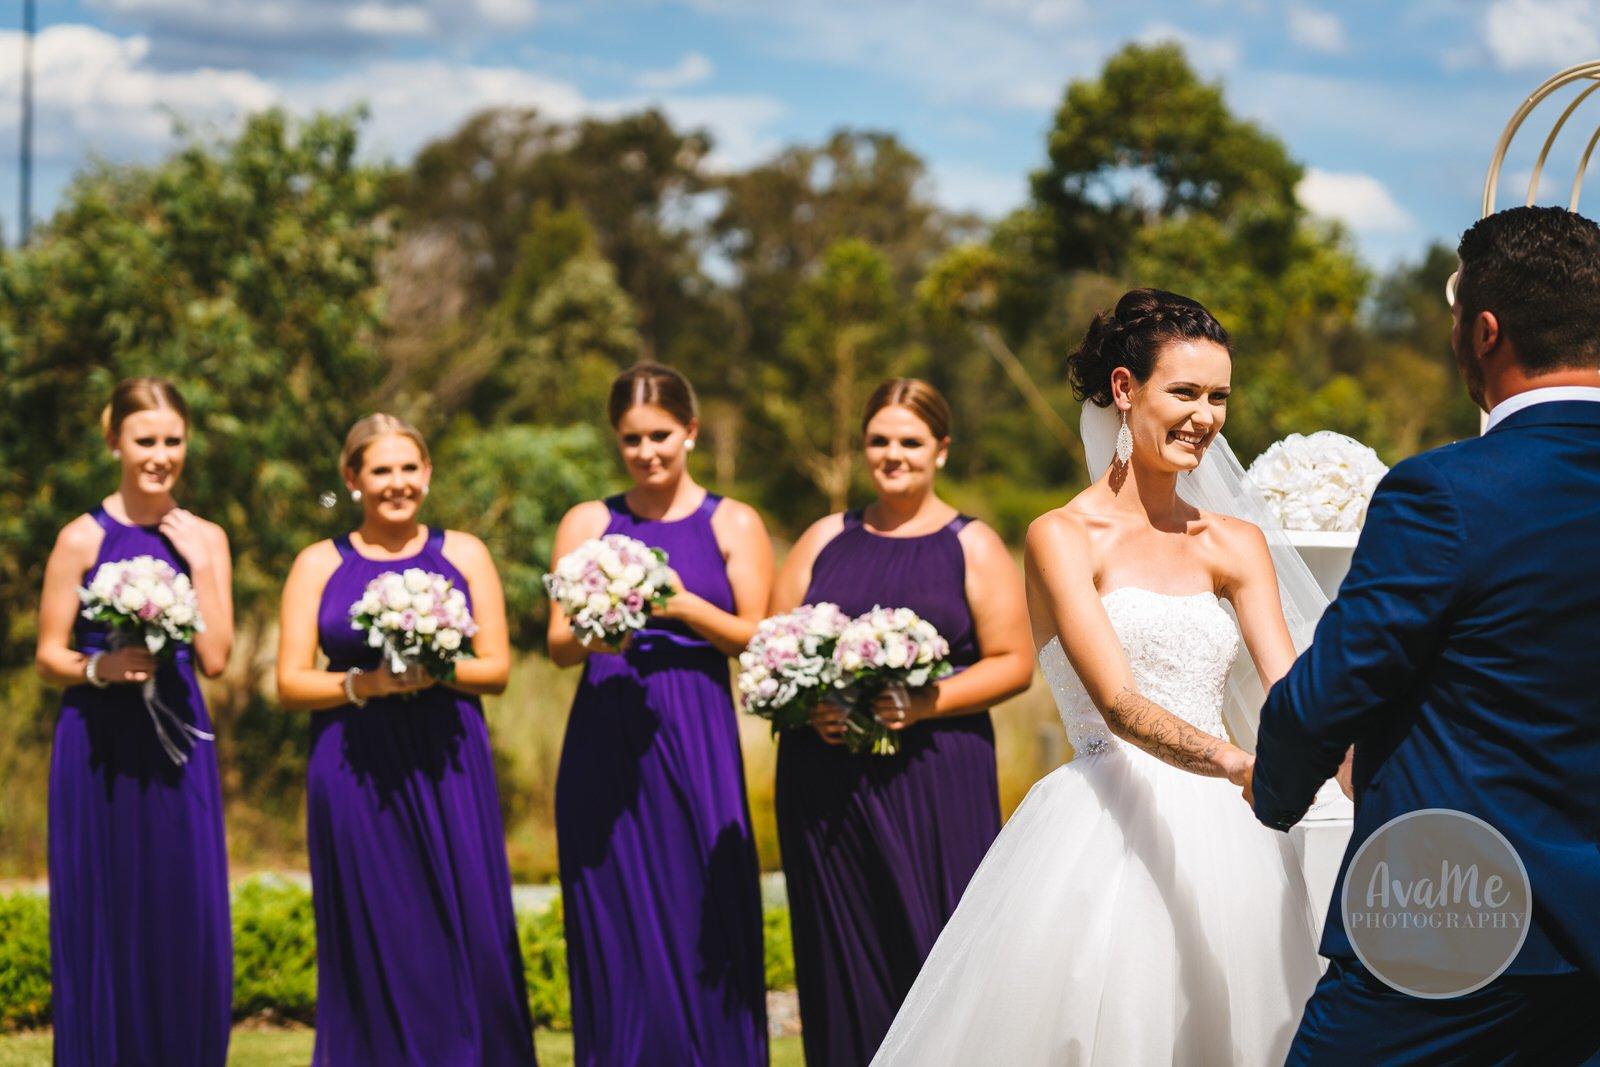 nat-josh-stonecutters-golf-club-wedding-colebee-053